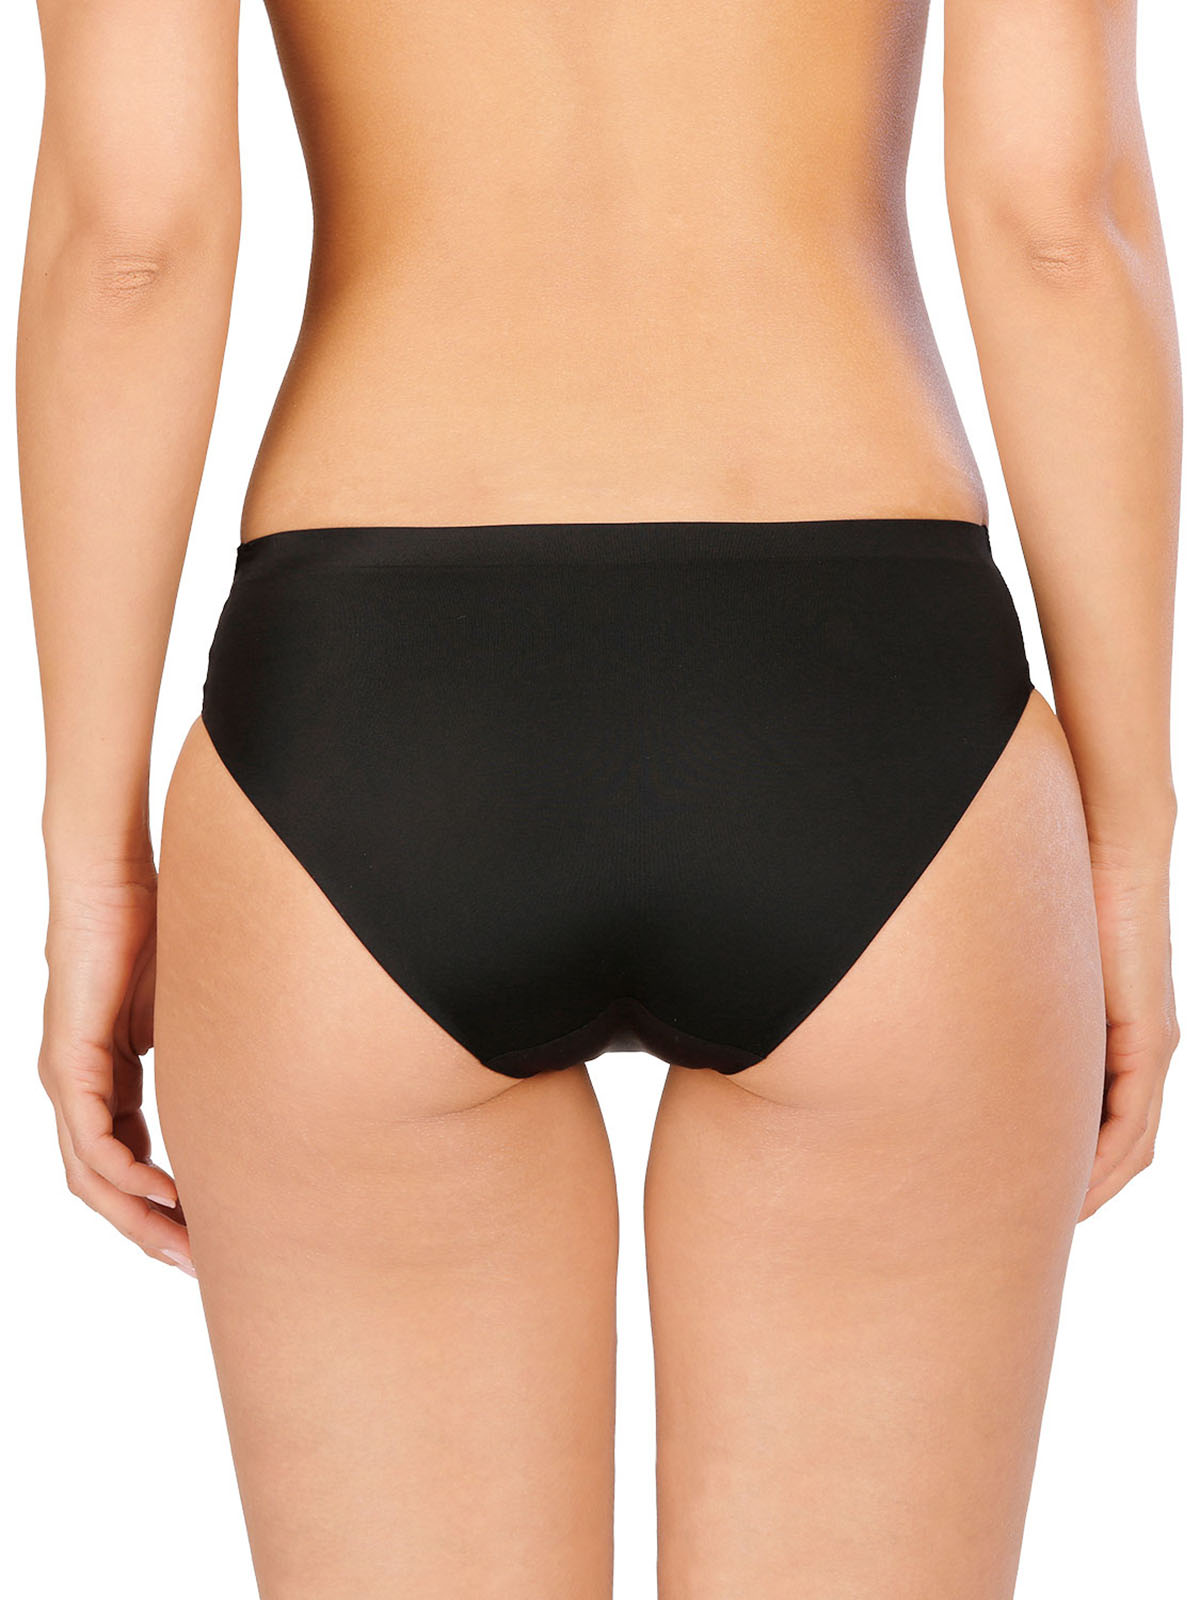 NATURANA Damen Bikini Slip 2er Pack 804746 Gr. S-XL